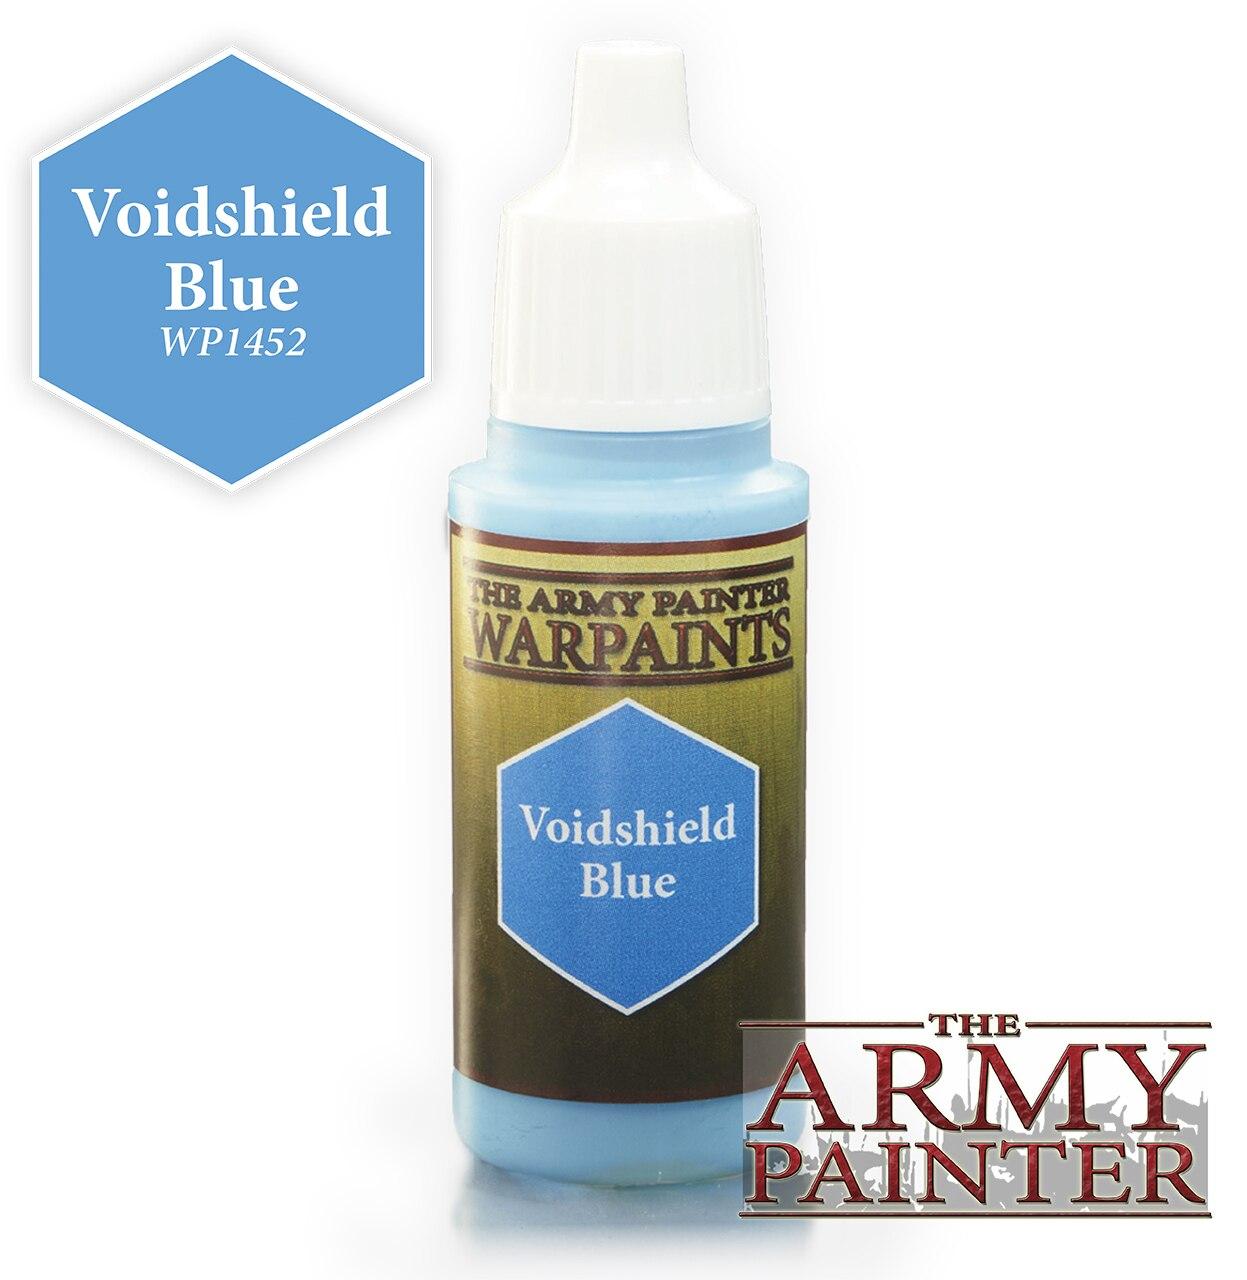 Army Painter Warpaint - Voidshield Blue